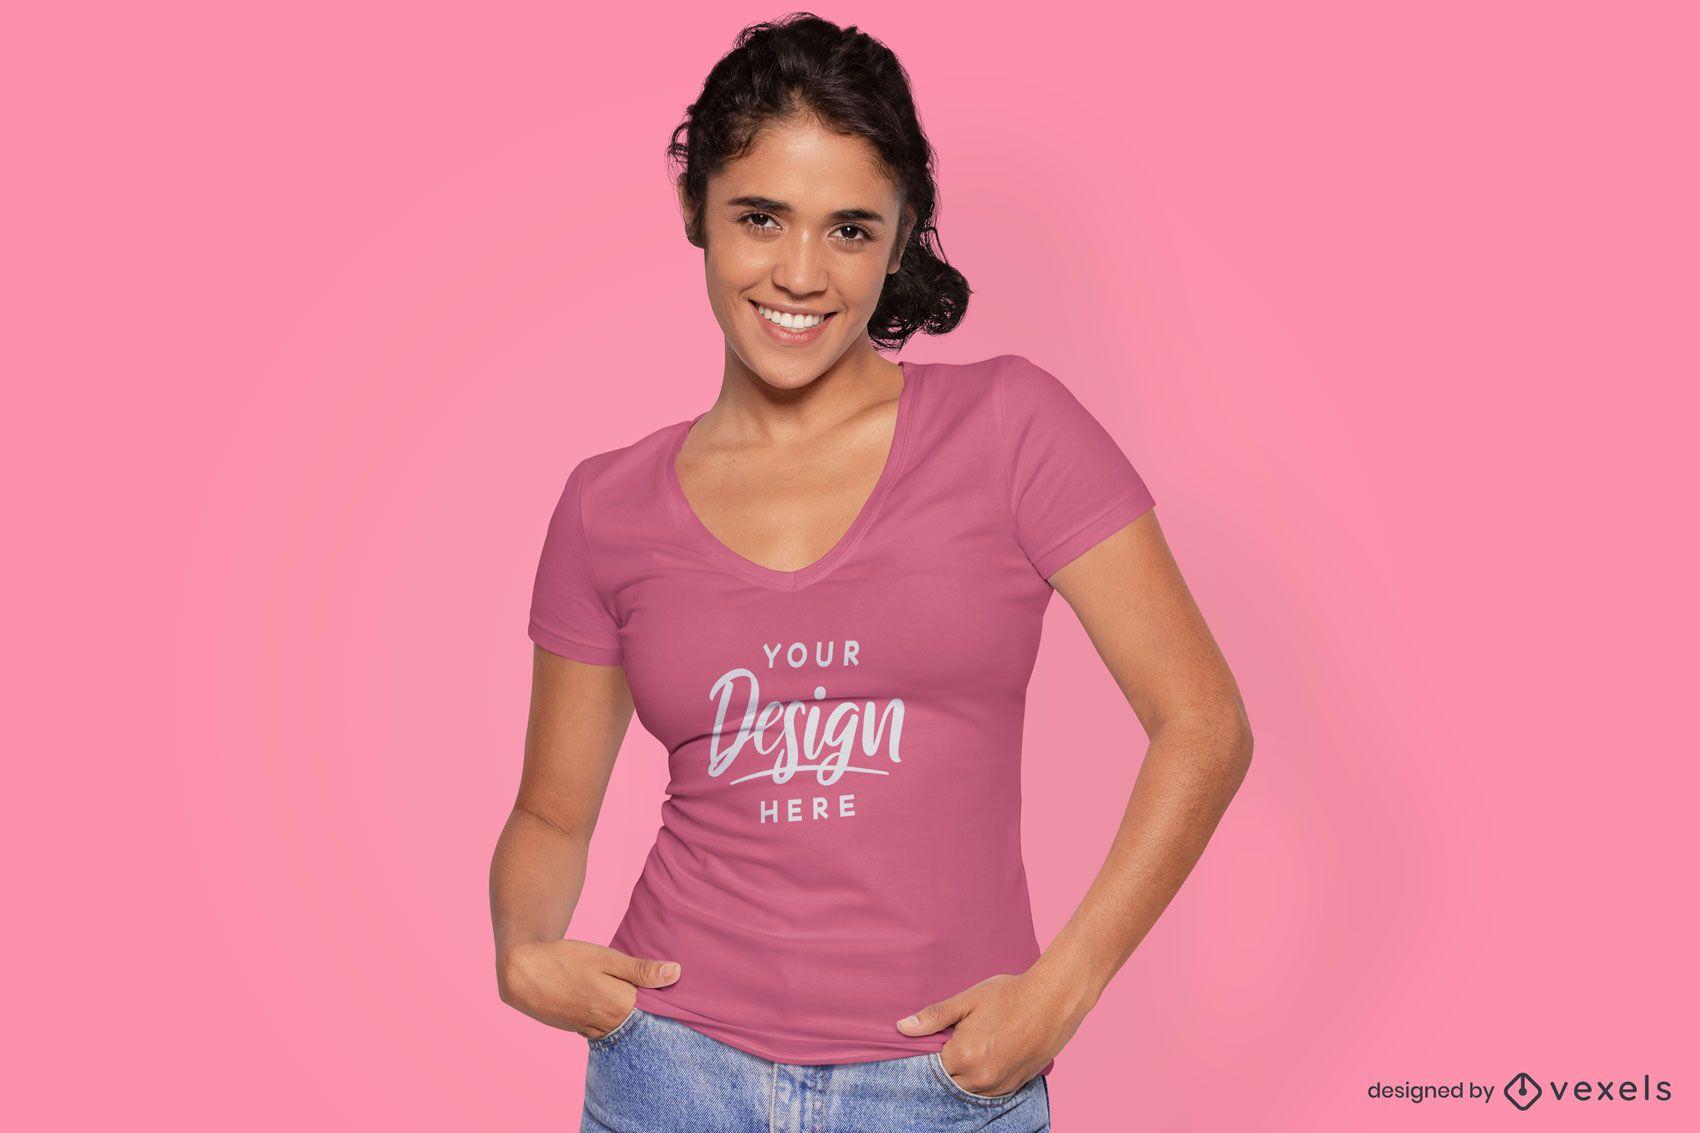 Female model in tight fit t-shirt mockup